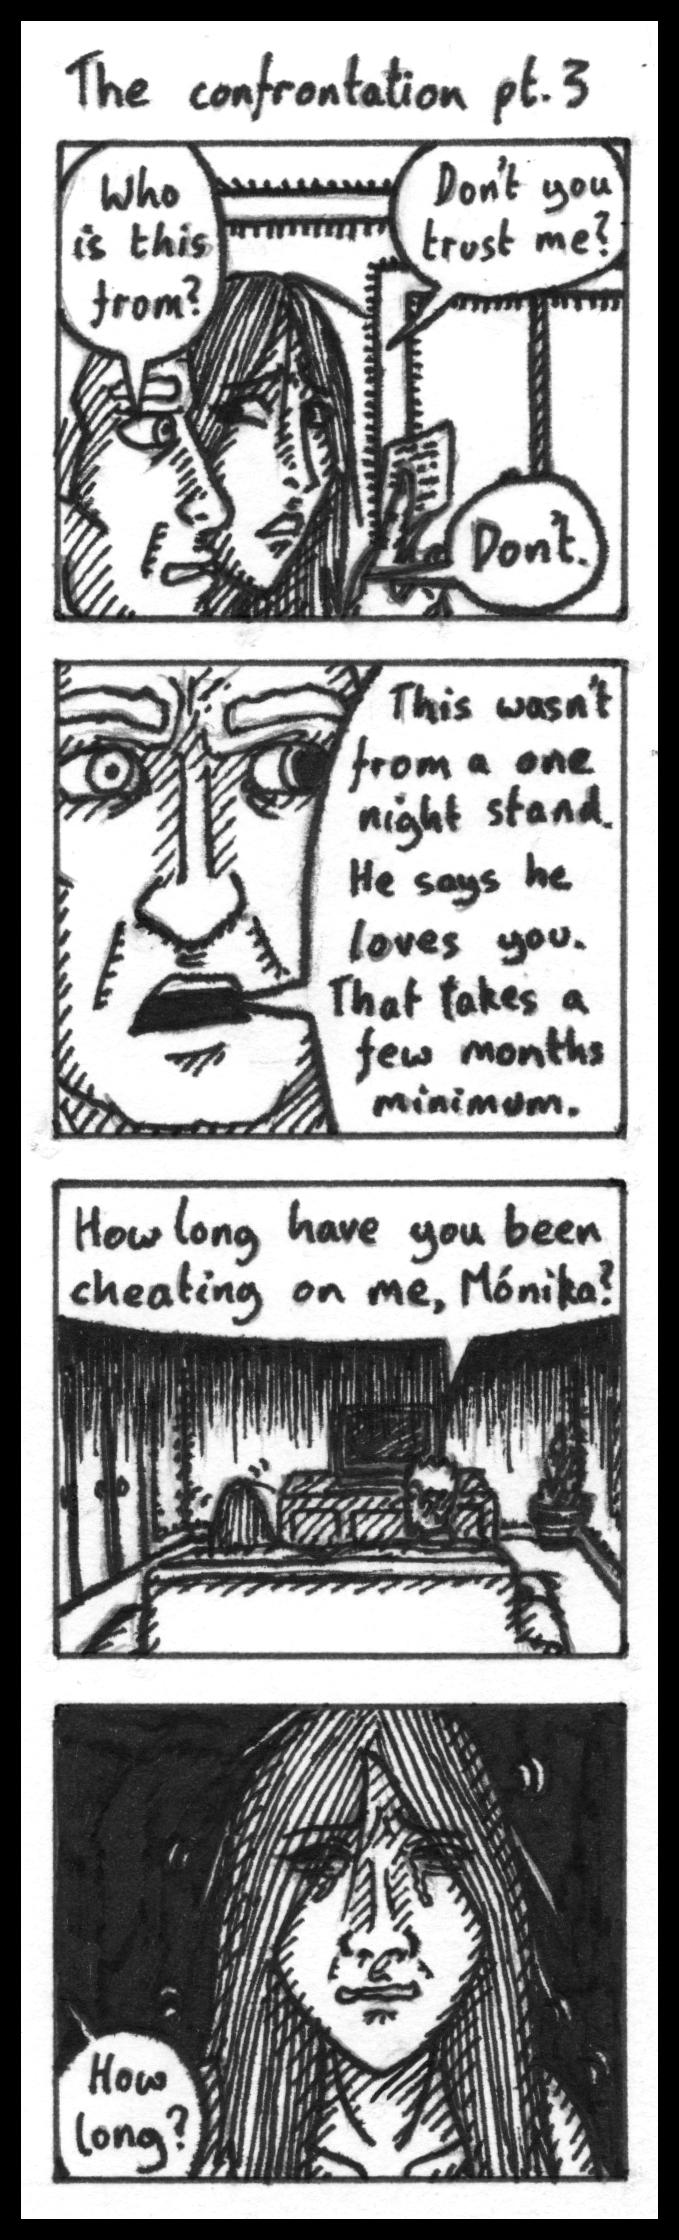 The confrontation pt.3 by Tallisman-Rogue